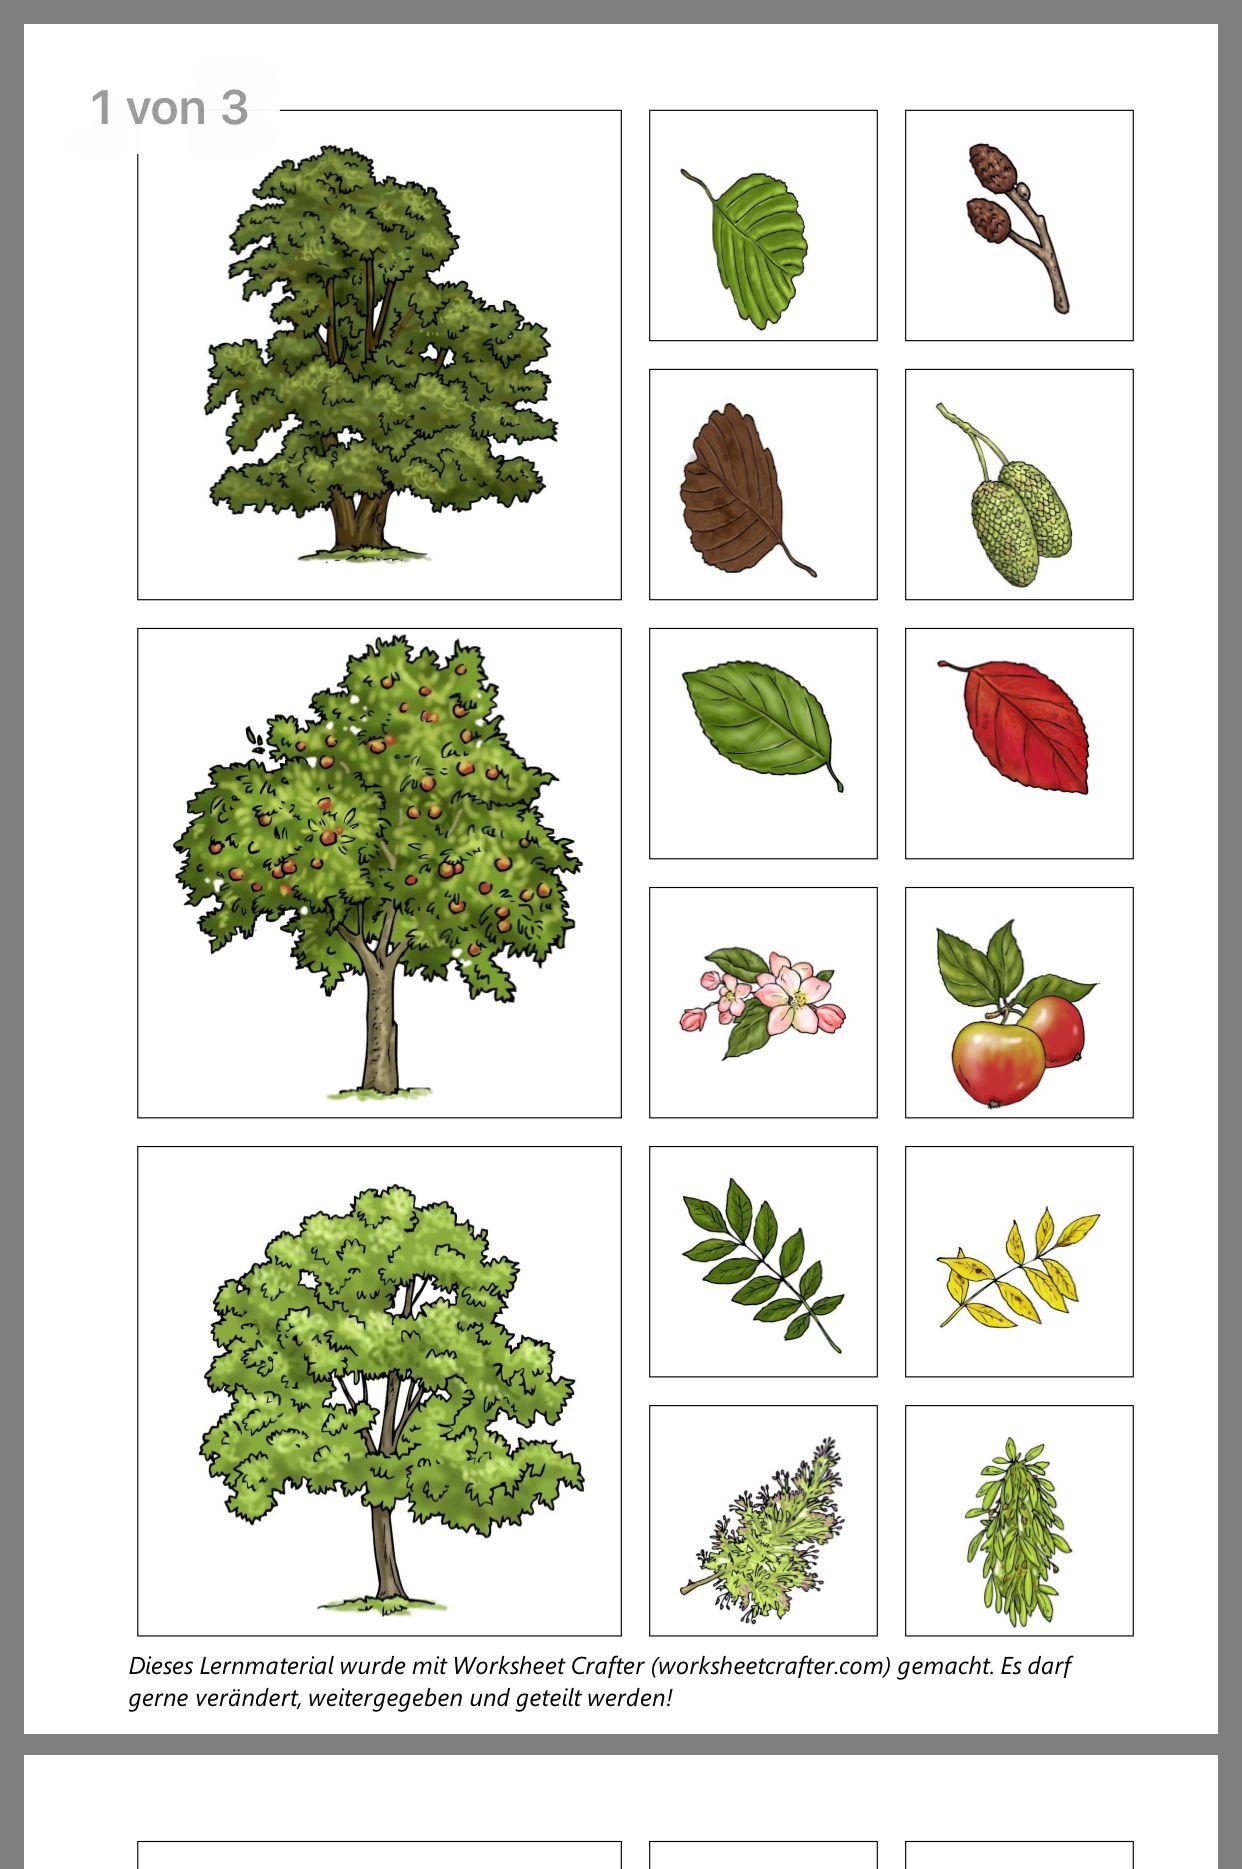 Laubbäume bestimmen heimische blätter Bäume